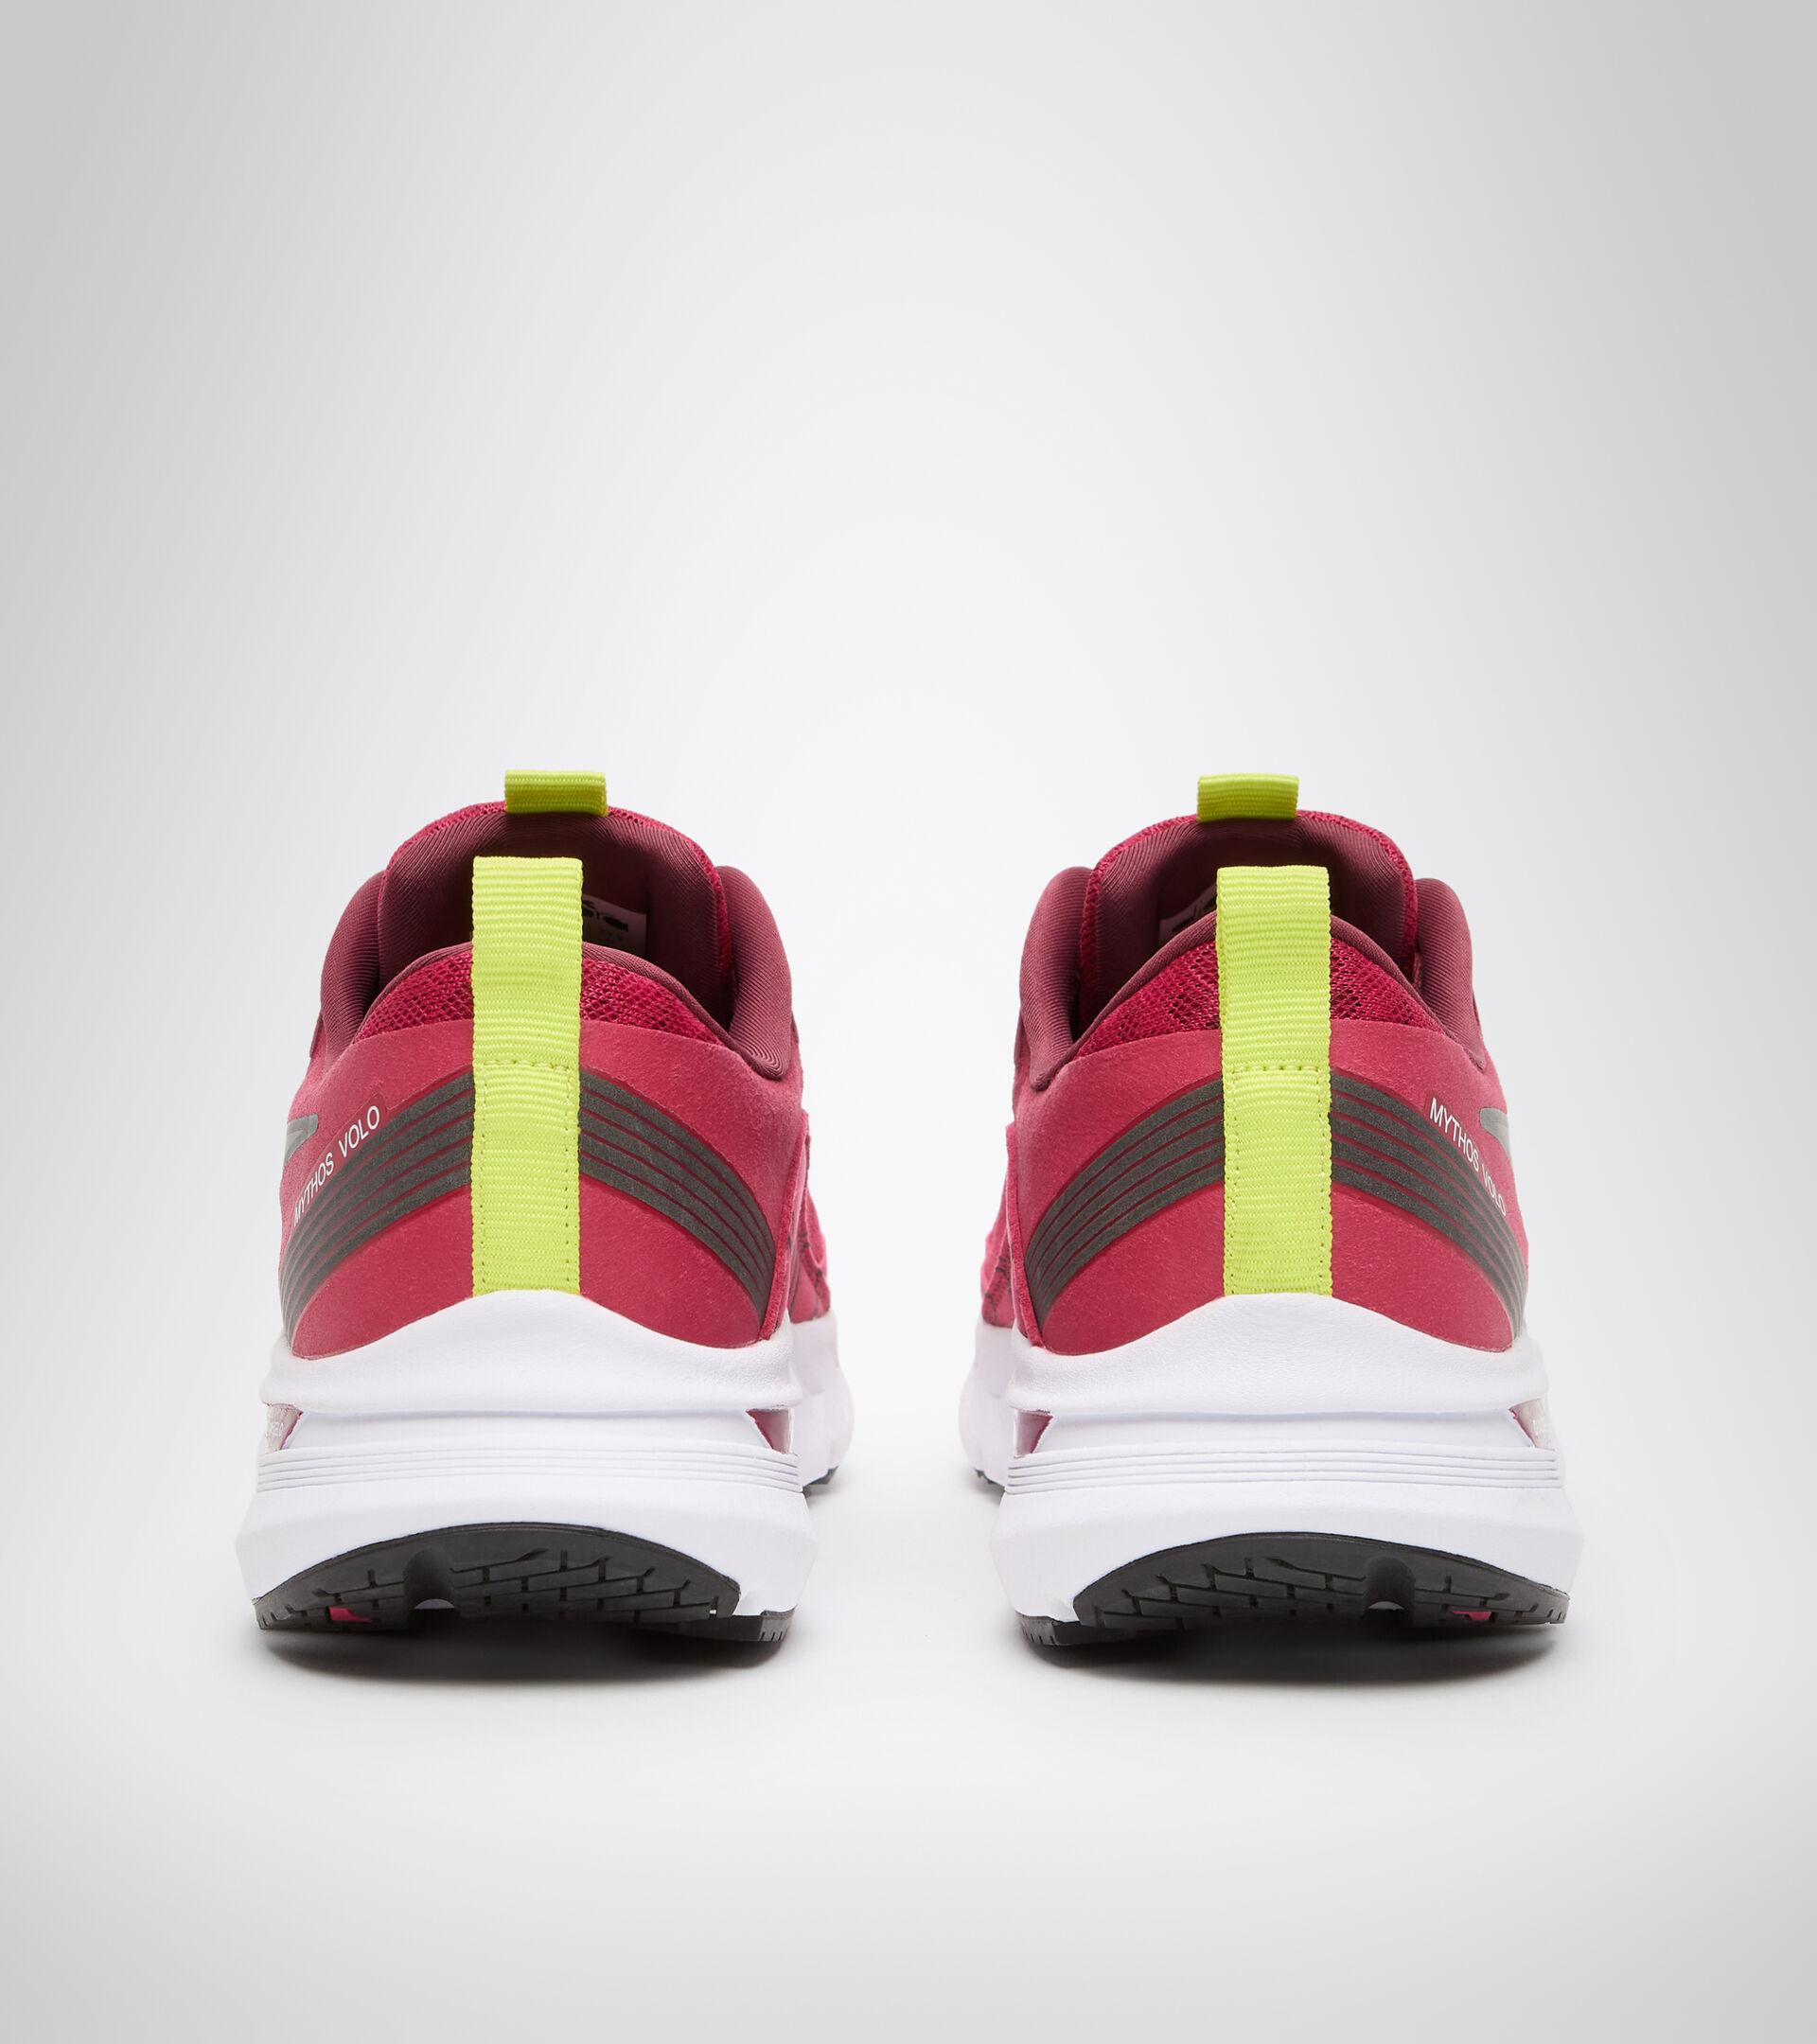 Chaussures de running - Femme MYTHOS BLUSHIELD VOLO W ROSE VOYANT/BLANC/ARGENT DD - Diadora